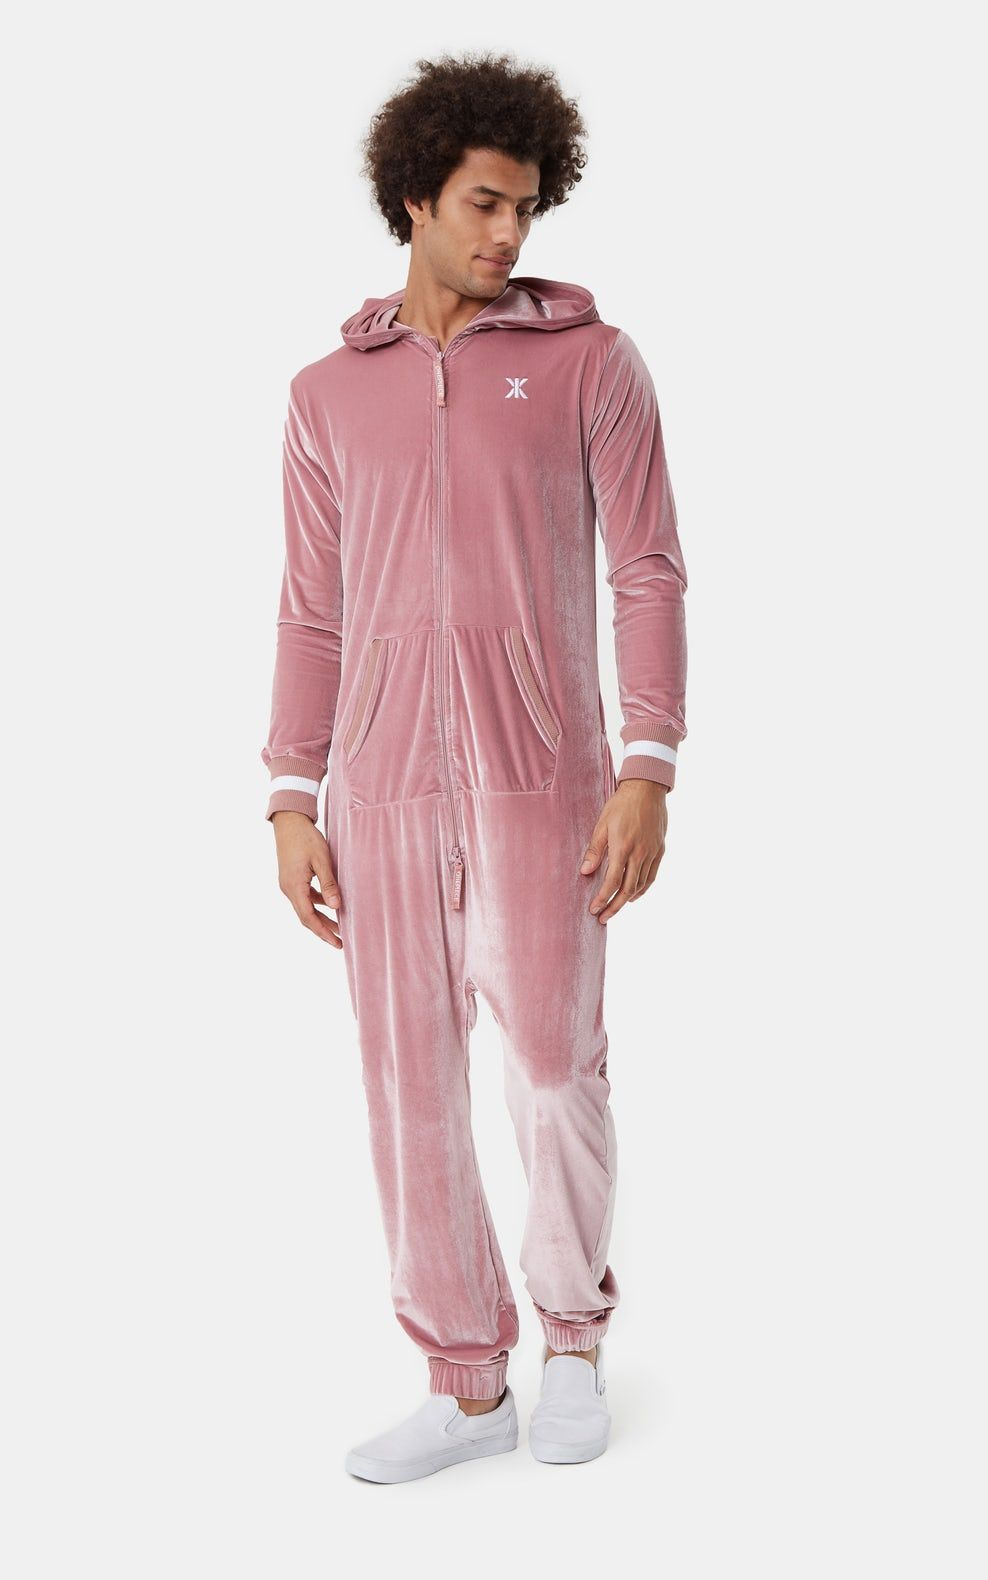 095cce95c017 Onepiece Original Velour Jumpsuit Faded Pink